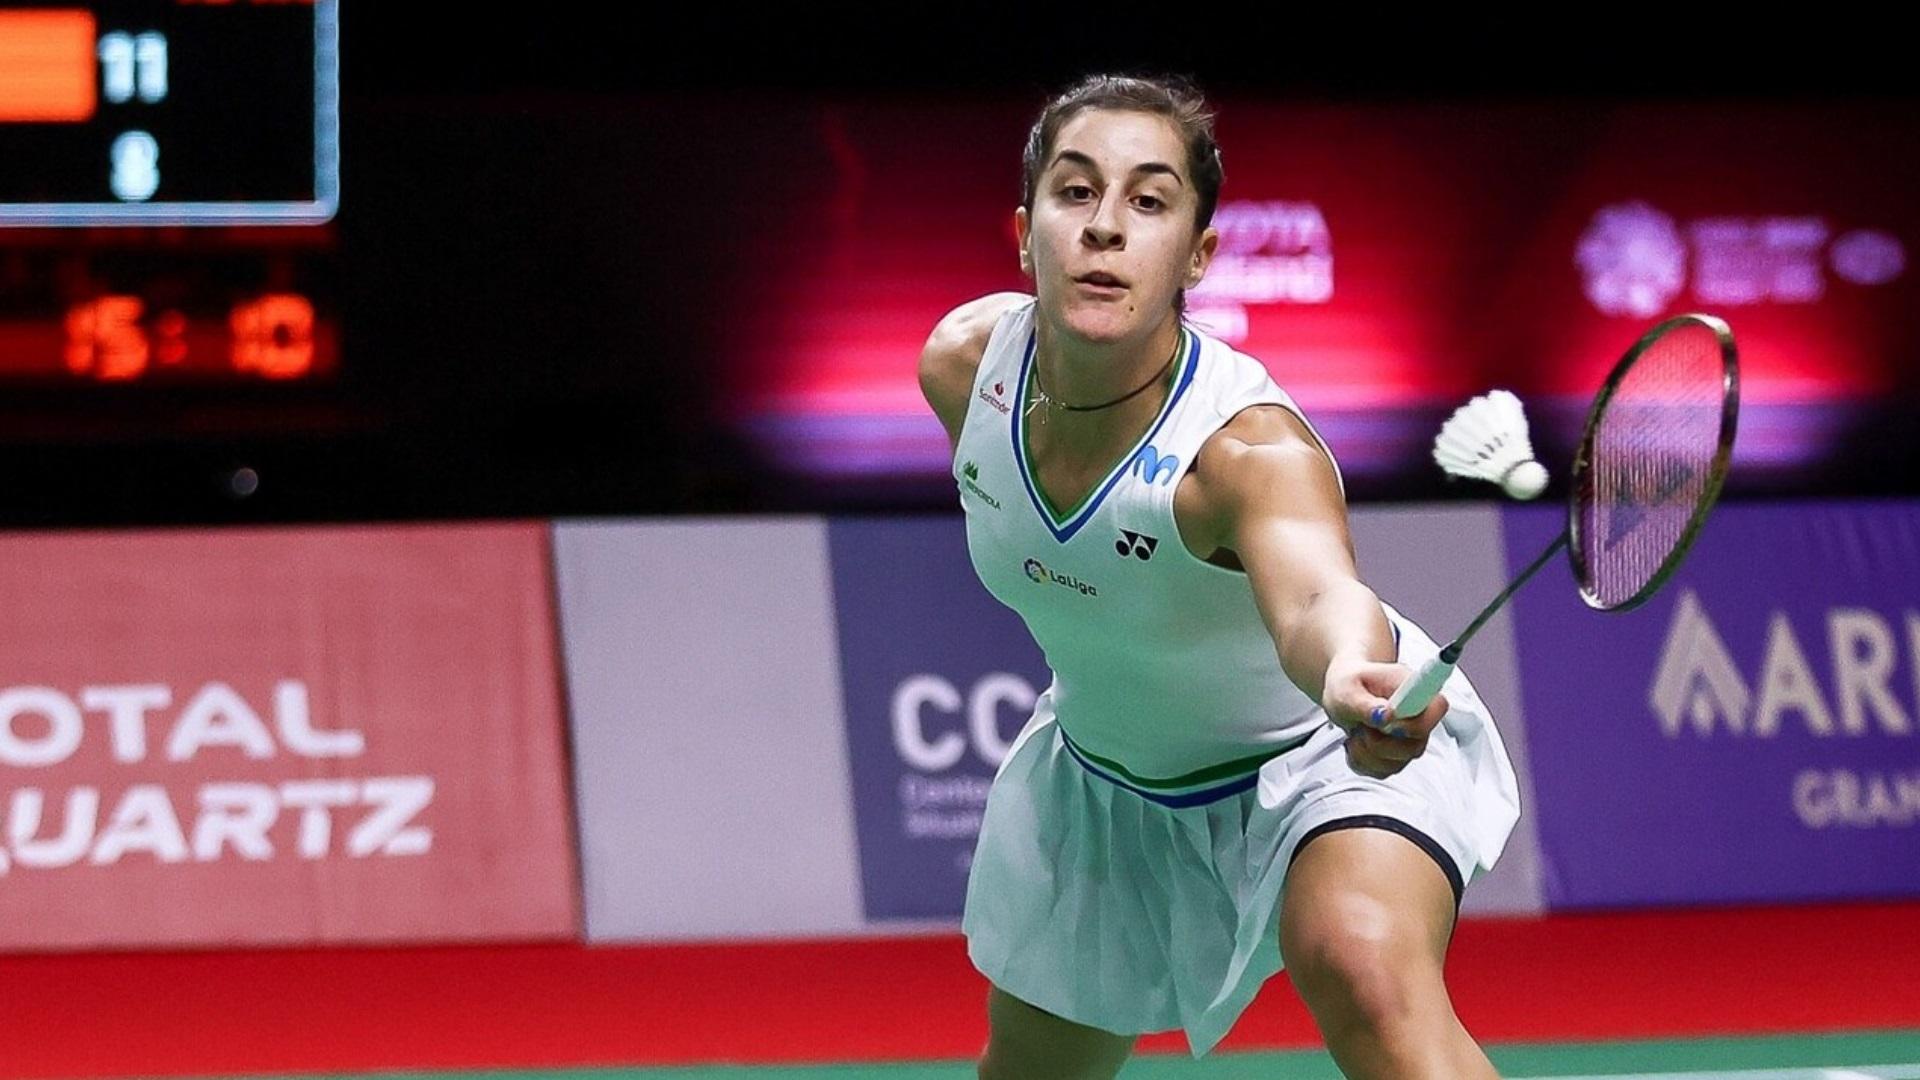 HSBC BWF World Tour Finals: C.Marín - E. Kosetskaya